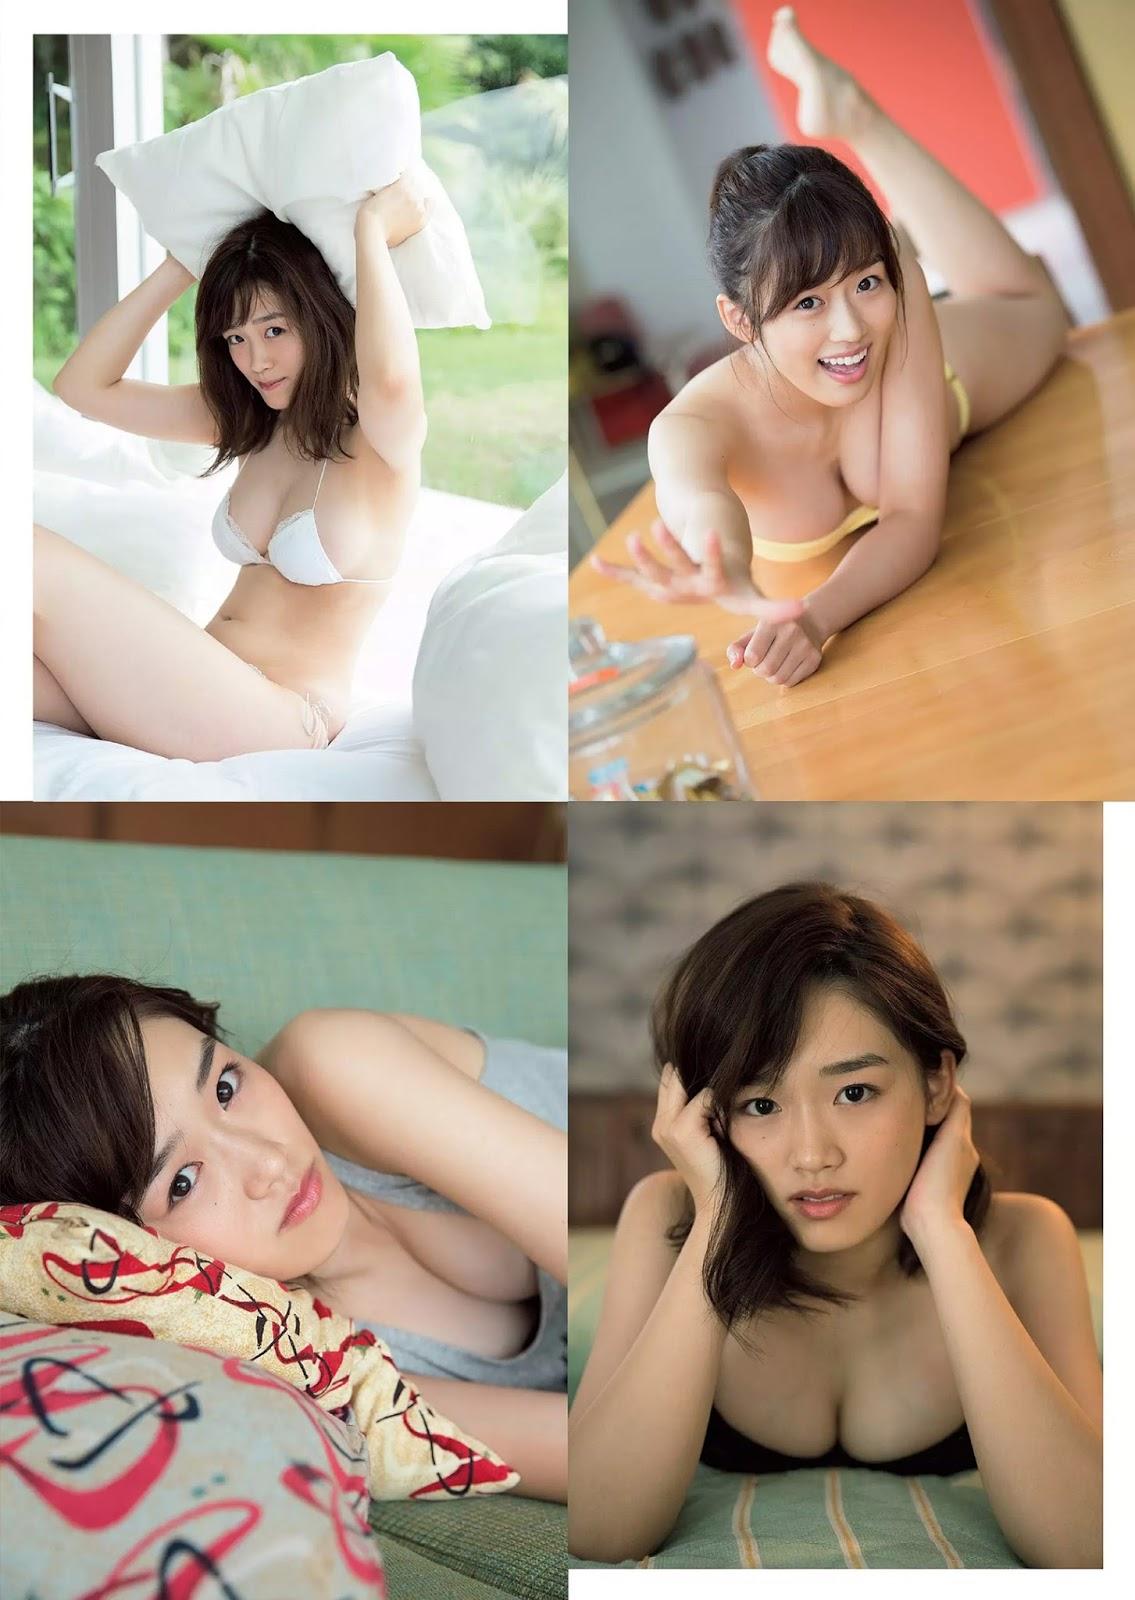 Umeta Ayano 梅田綾乃, Weekly Playboy 2017 No.49 (週刊プレイボーイ 2017年49号)